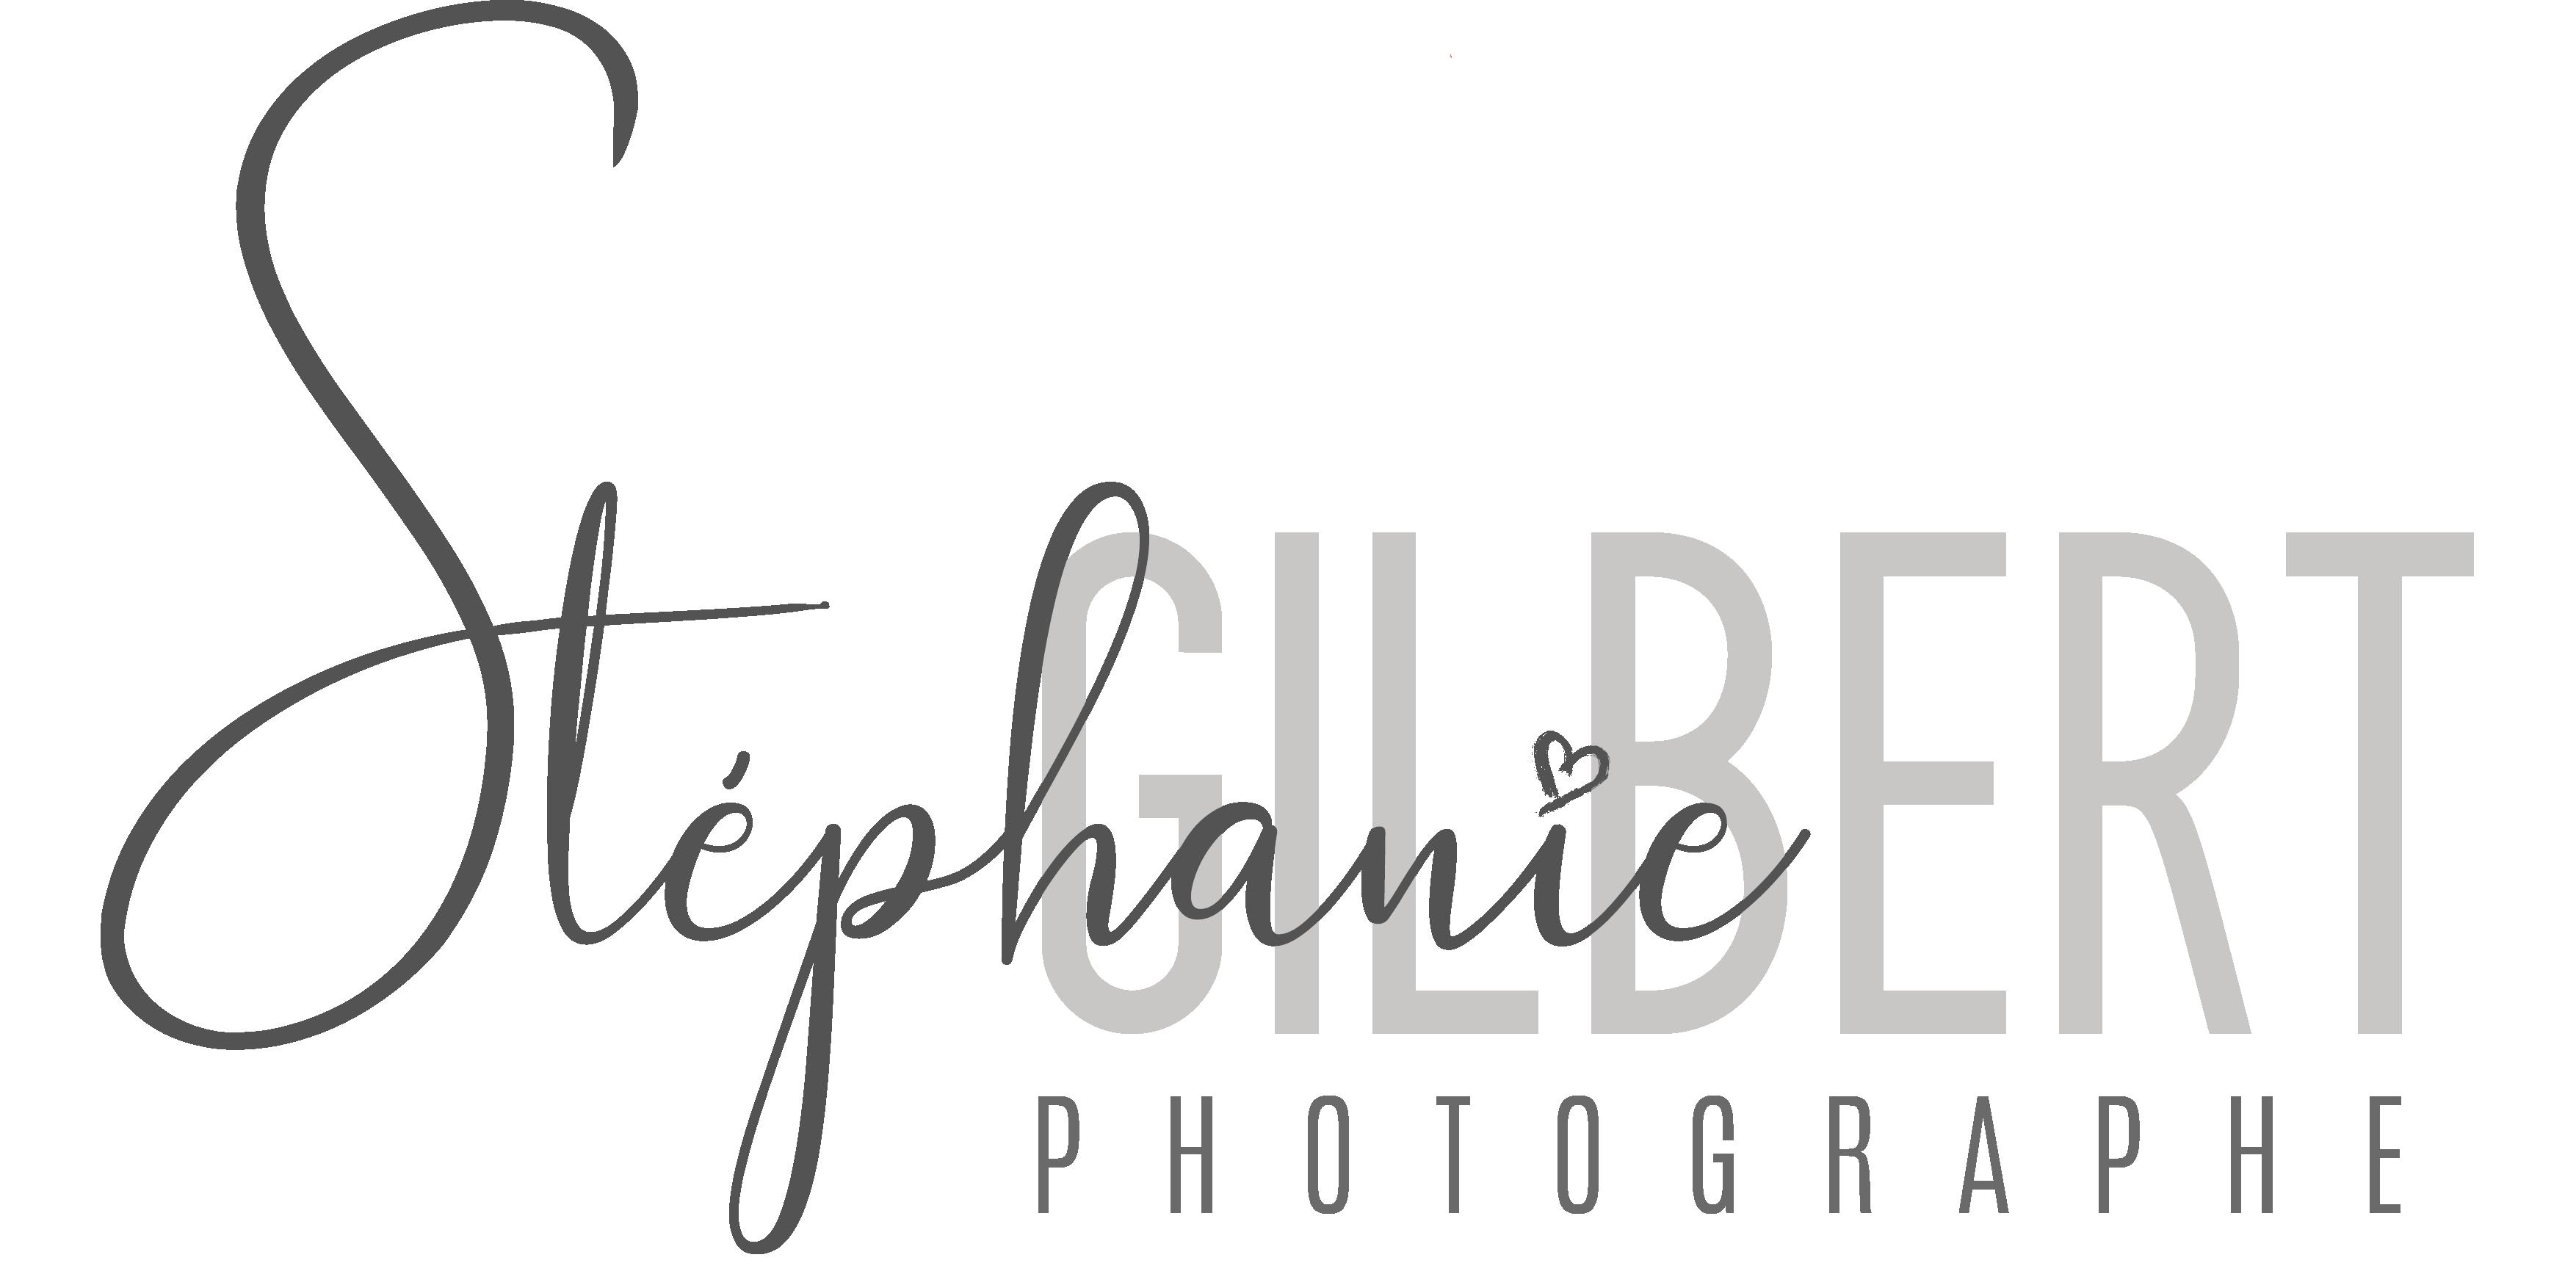 Stéphanie Gilbert, Photographe basée à Saint-Georges de Beauce